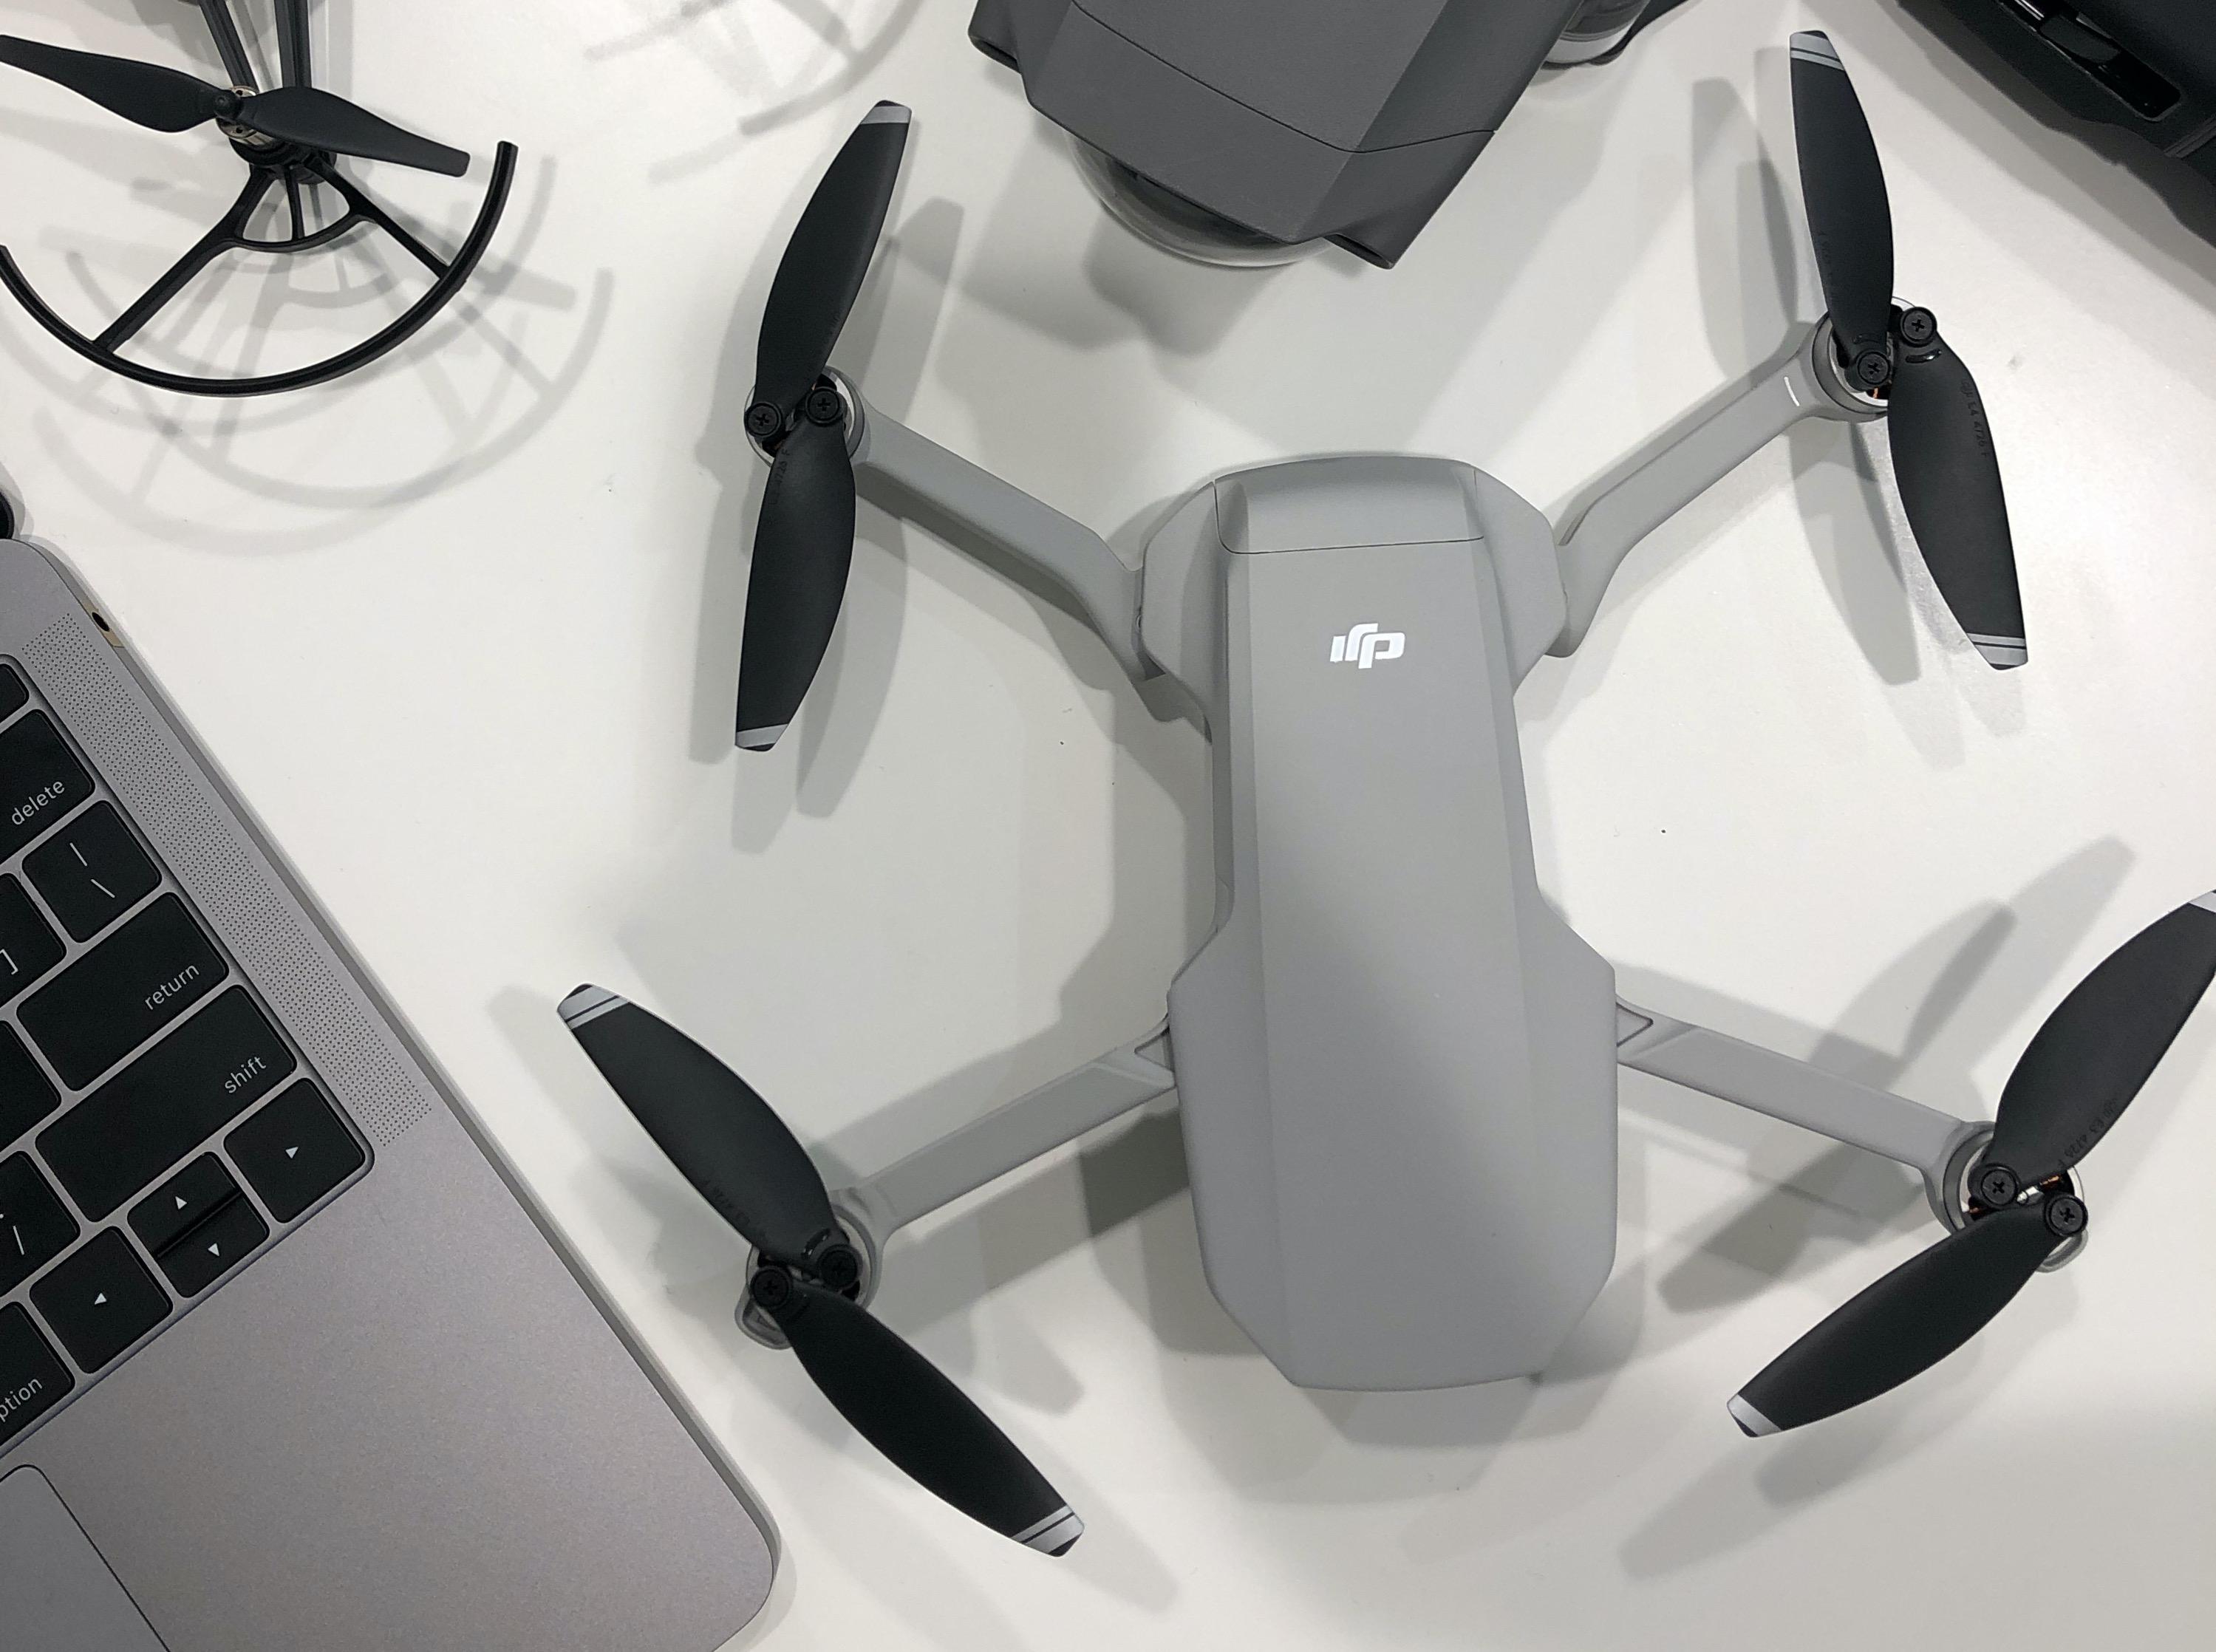 Dji Mavic Mini What Can You Do With A 249g Drone Drone News Coastal Drone